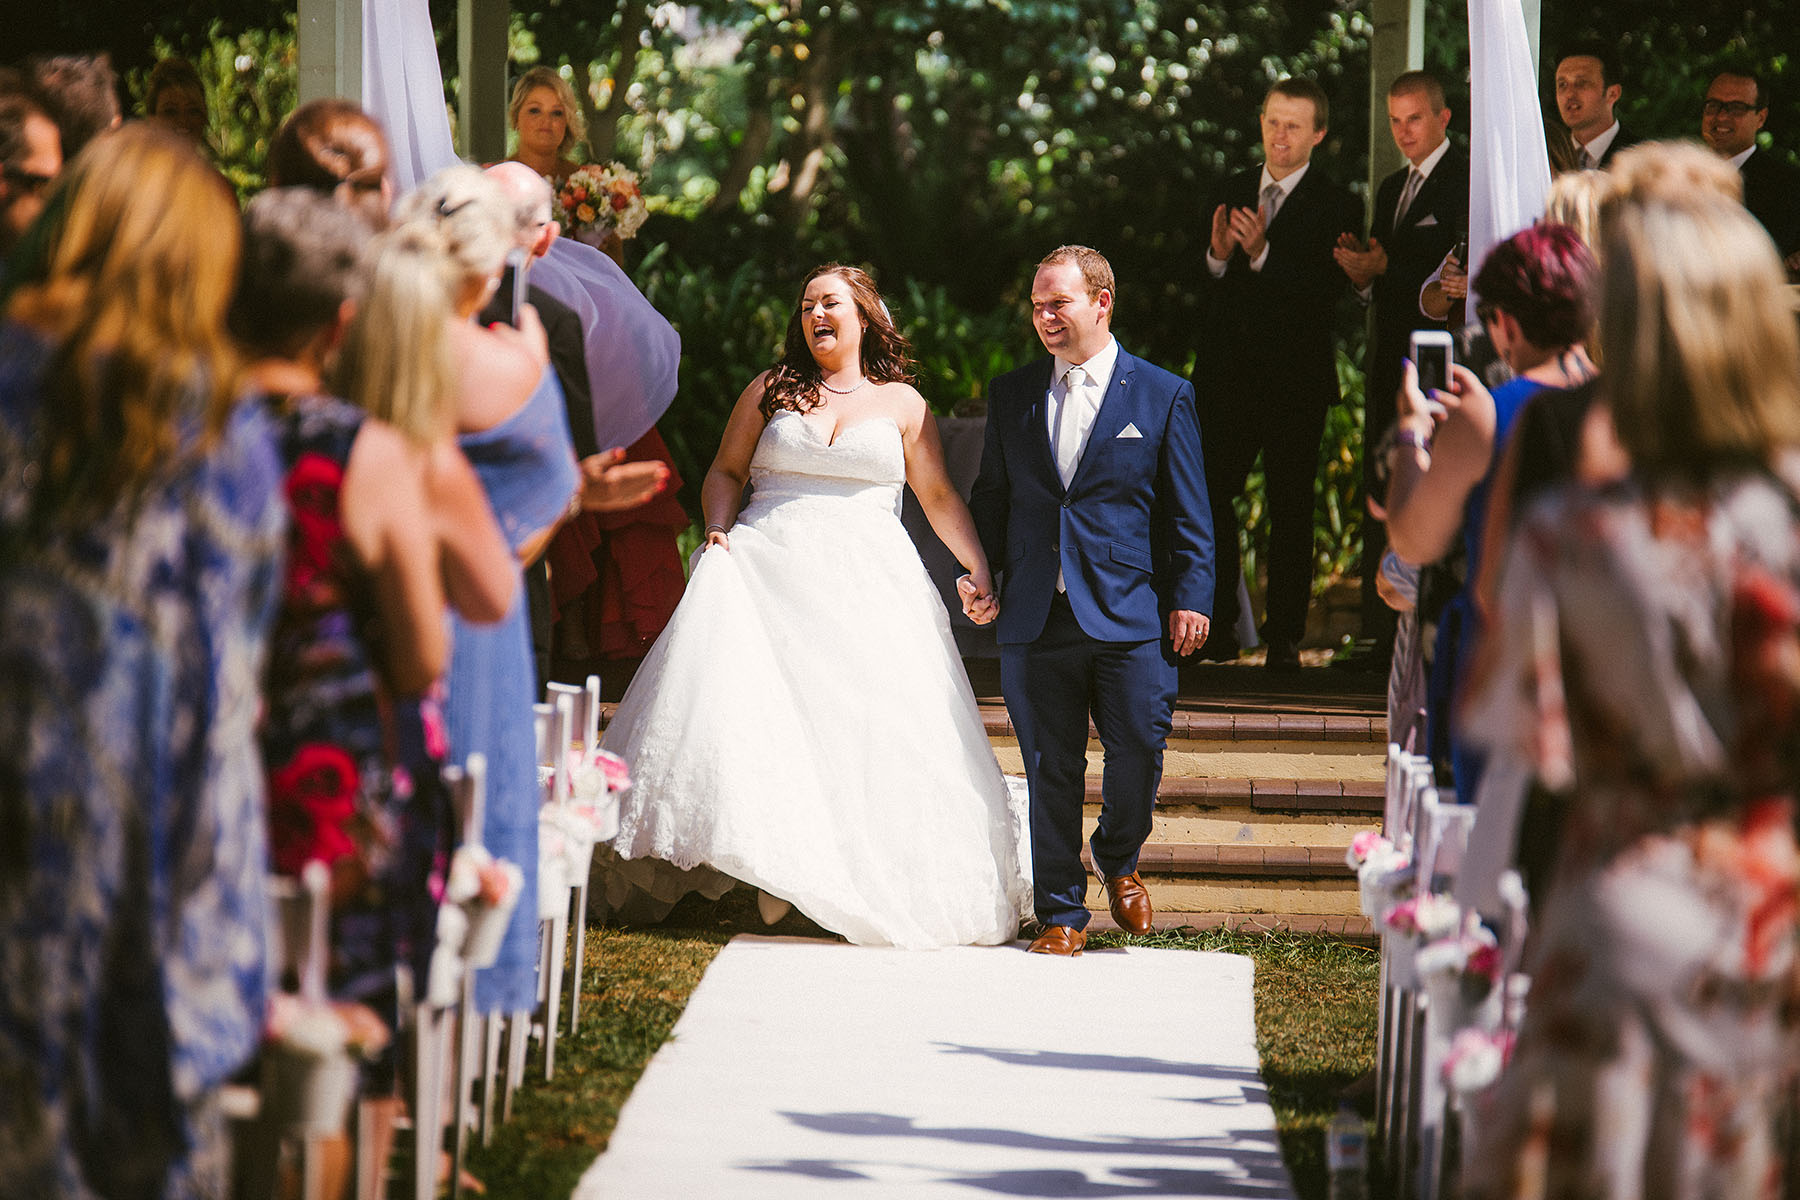 Marryme_wedding_photography_dorrigo_bellingen_photographer_4.jpg